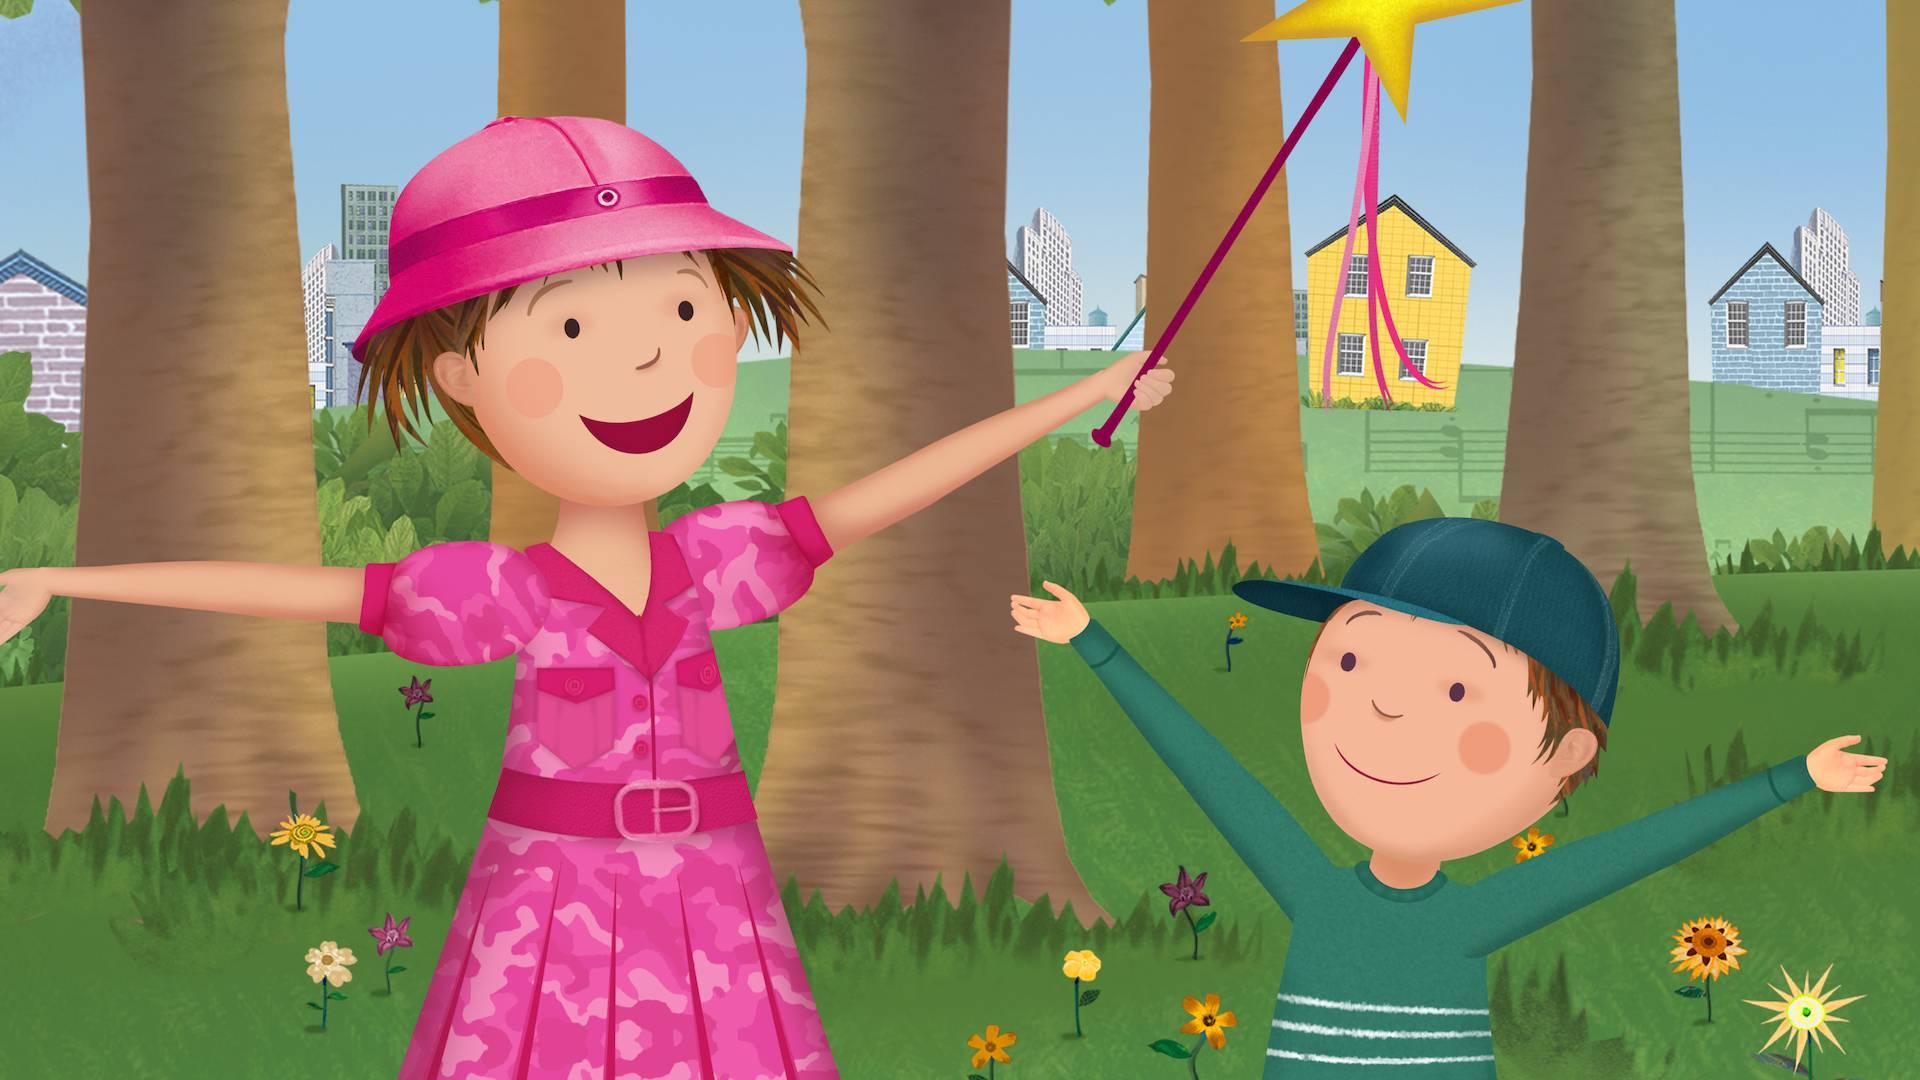 Pbs Kids Announces New Series Pinkalicious Amp Peterrific